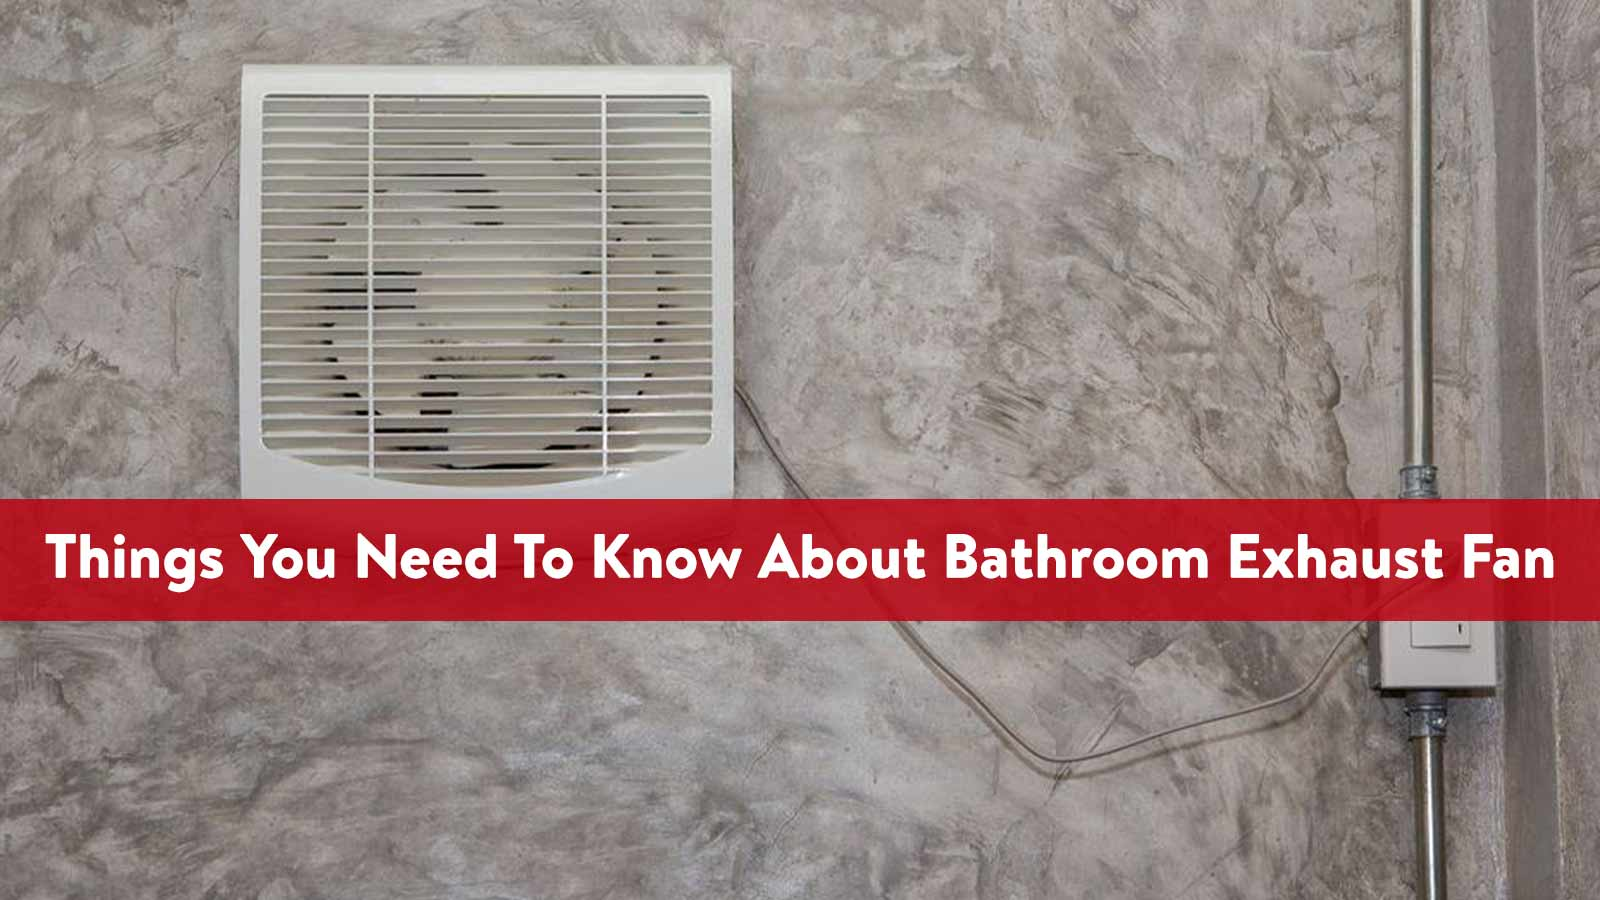 How to Improve Ventilation in Bathroom